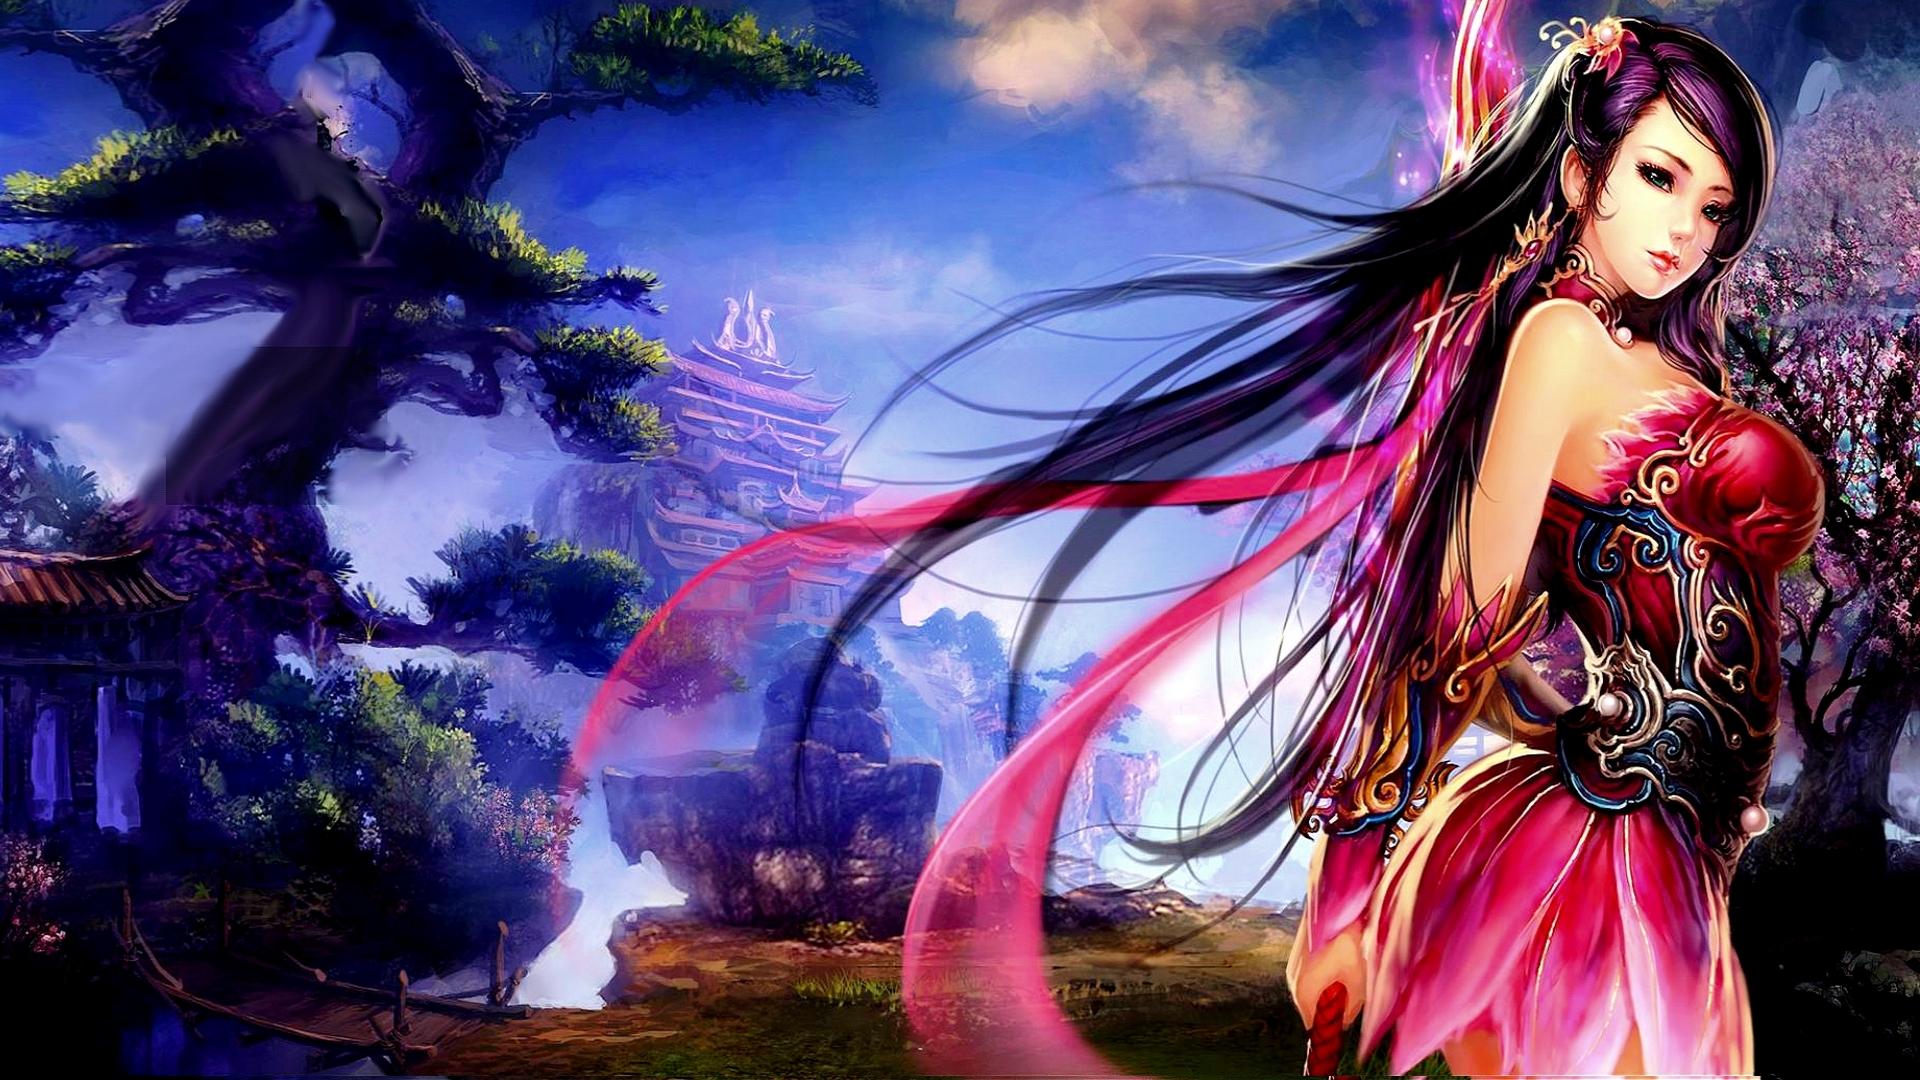 Fantasy Women Wallpapers HD Widescreen